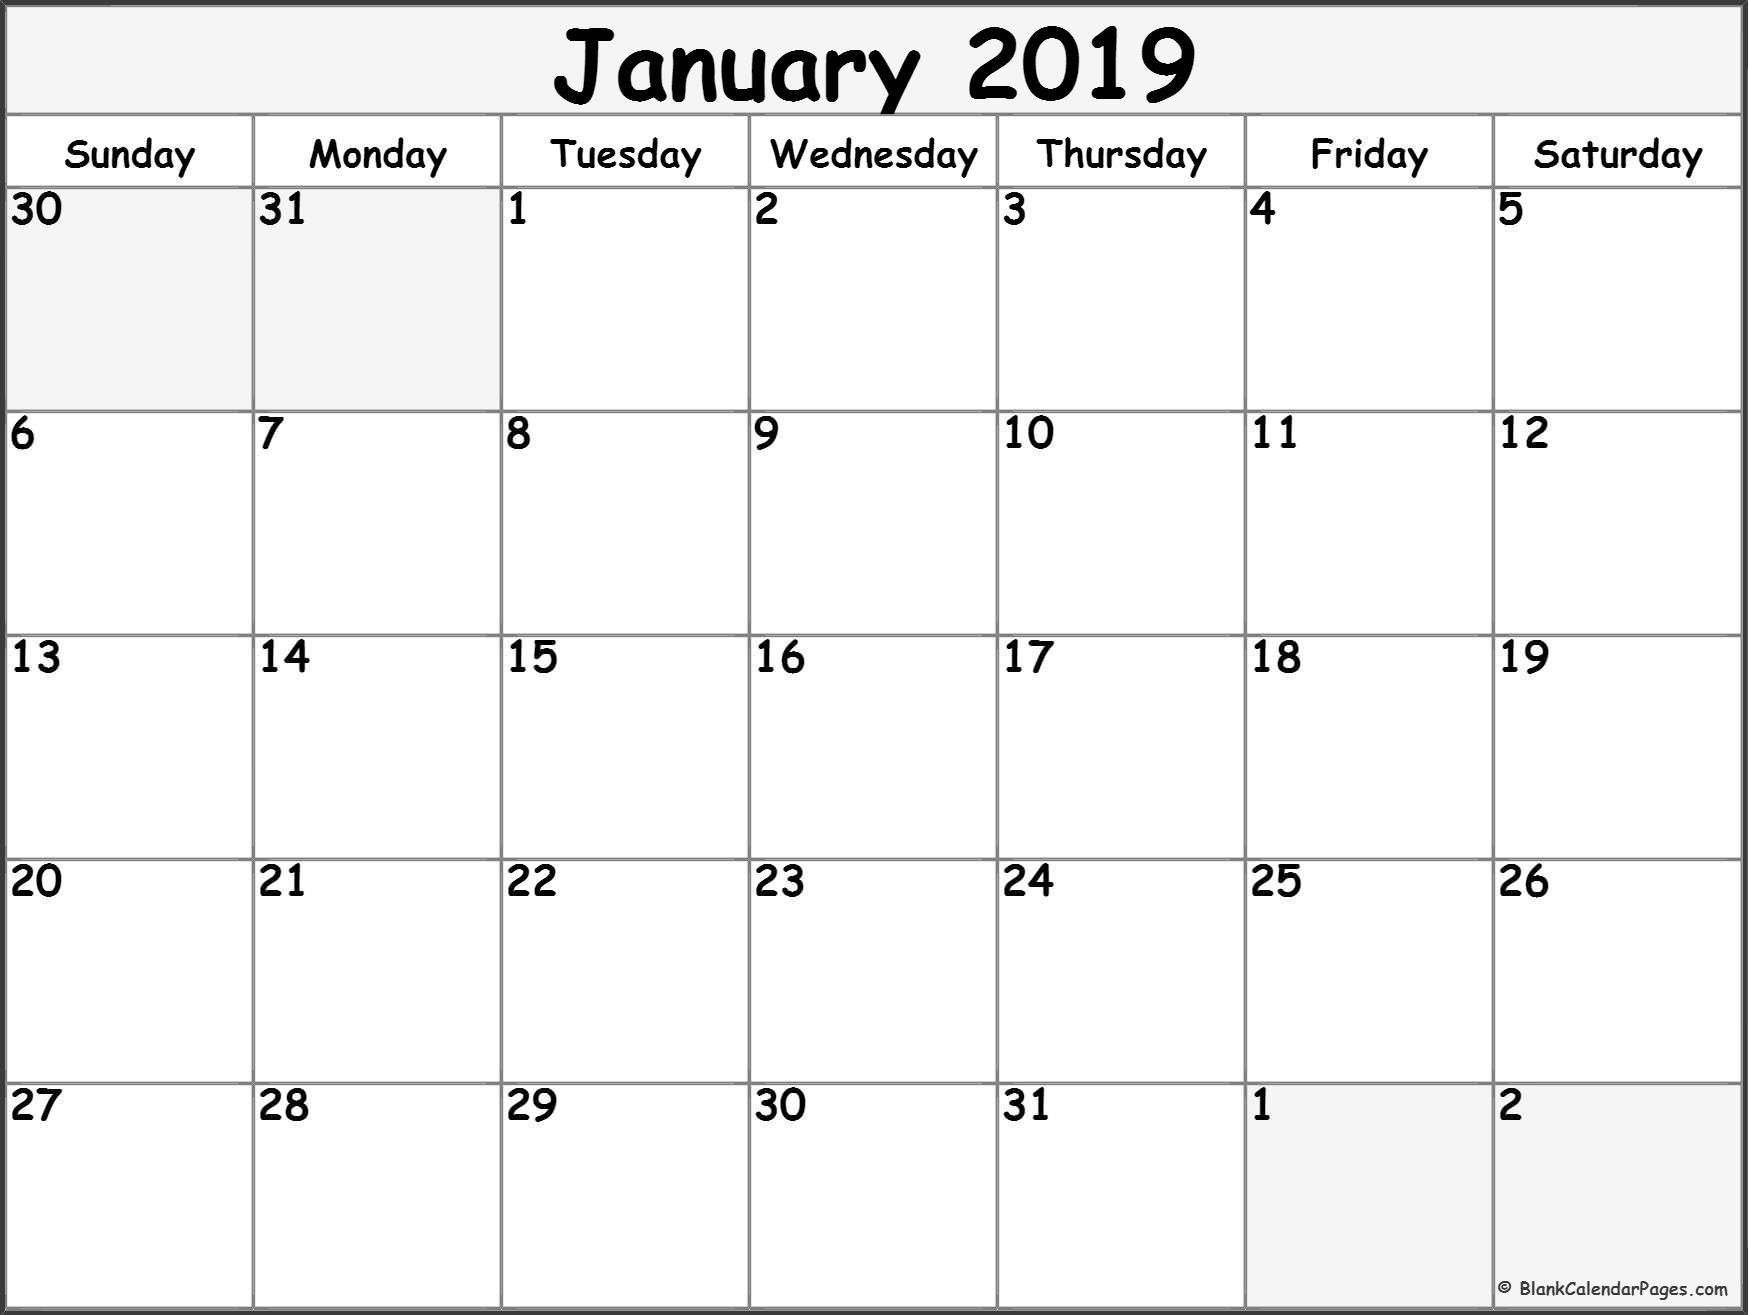 January 2019 Blank Calendar Templates. with regard to 3 Month Blank Calendar Template